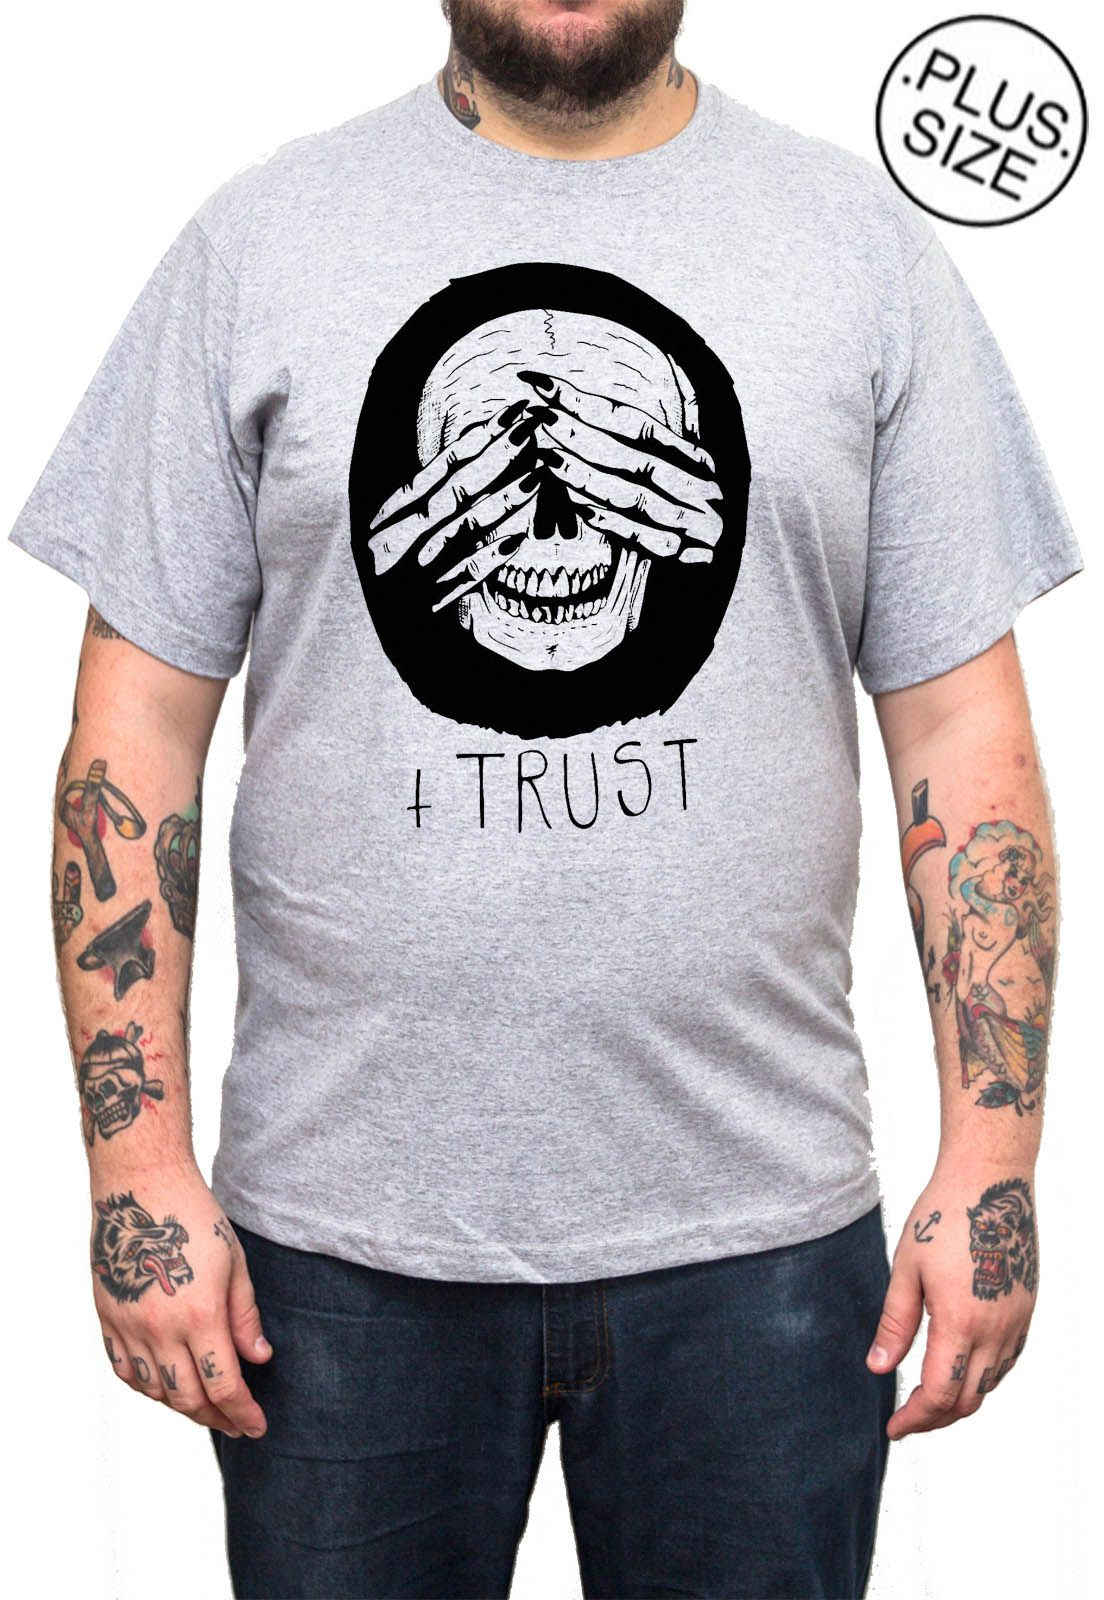 Camiseta Hshop Trust Me - Cinza Mescla - Plus Size - Tamanho Grande XG  - HShop